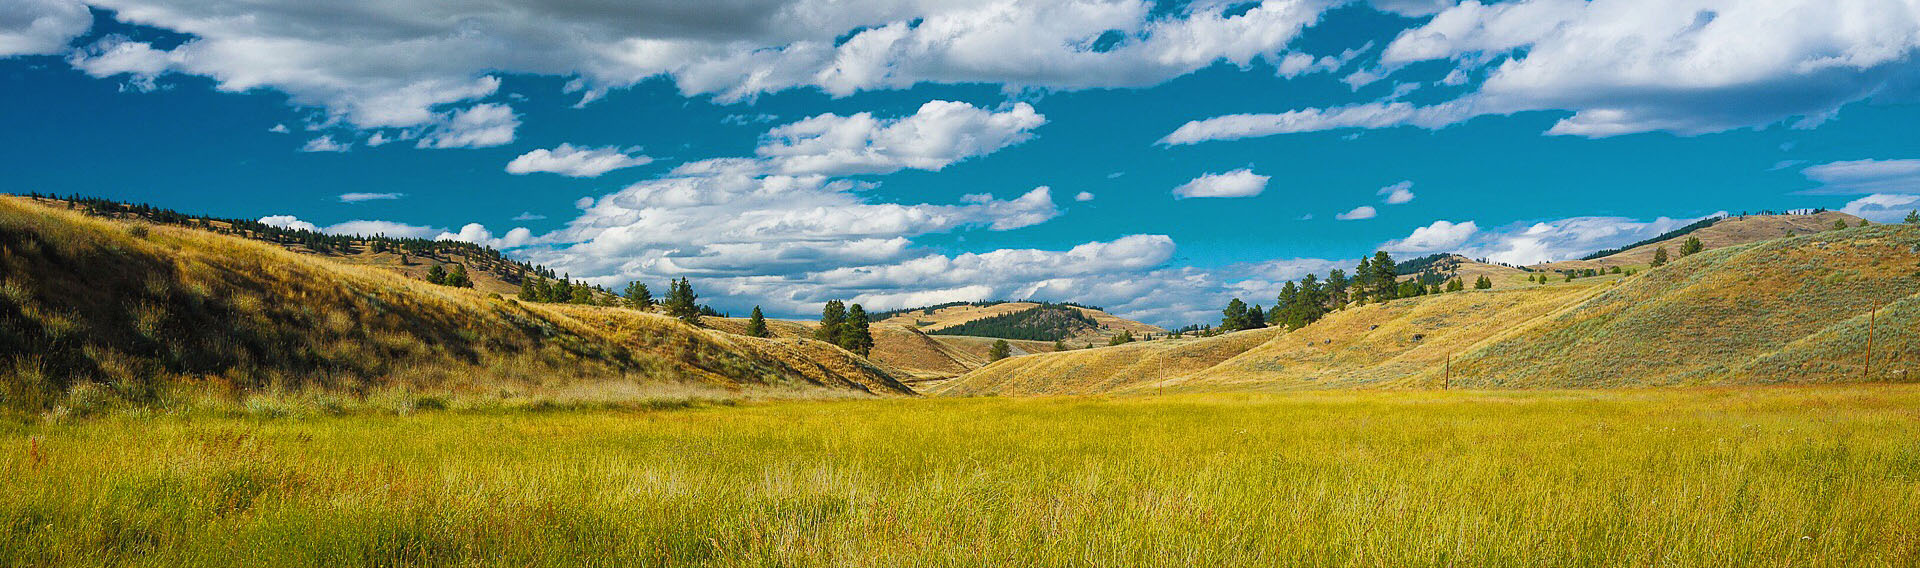 Okanogan Highlands